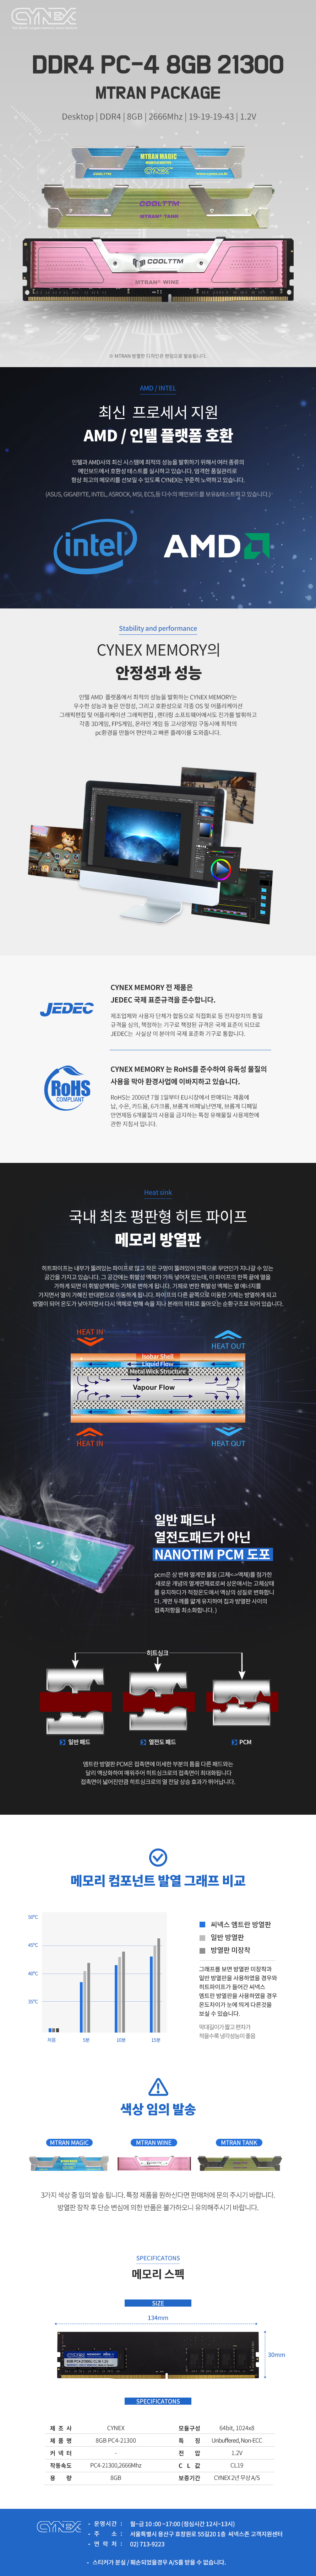 CYNEX DDR4 8G PC4-21300 CL19 엠트란